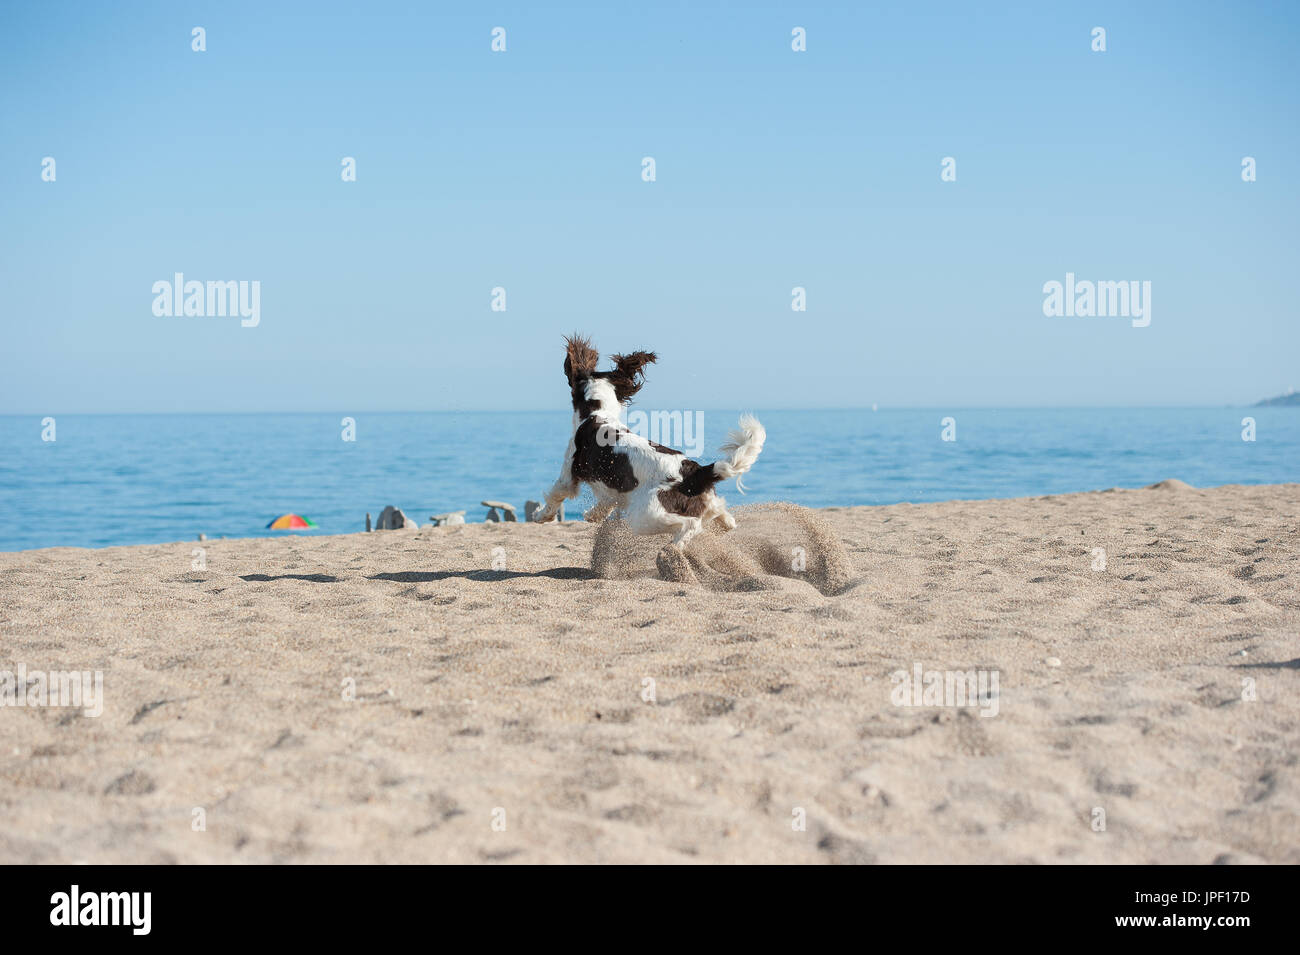 Springer spaniel on a beach - Stock Image